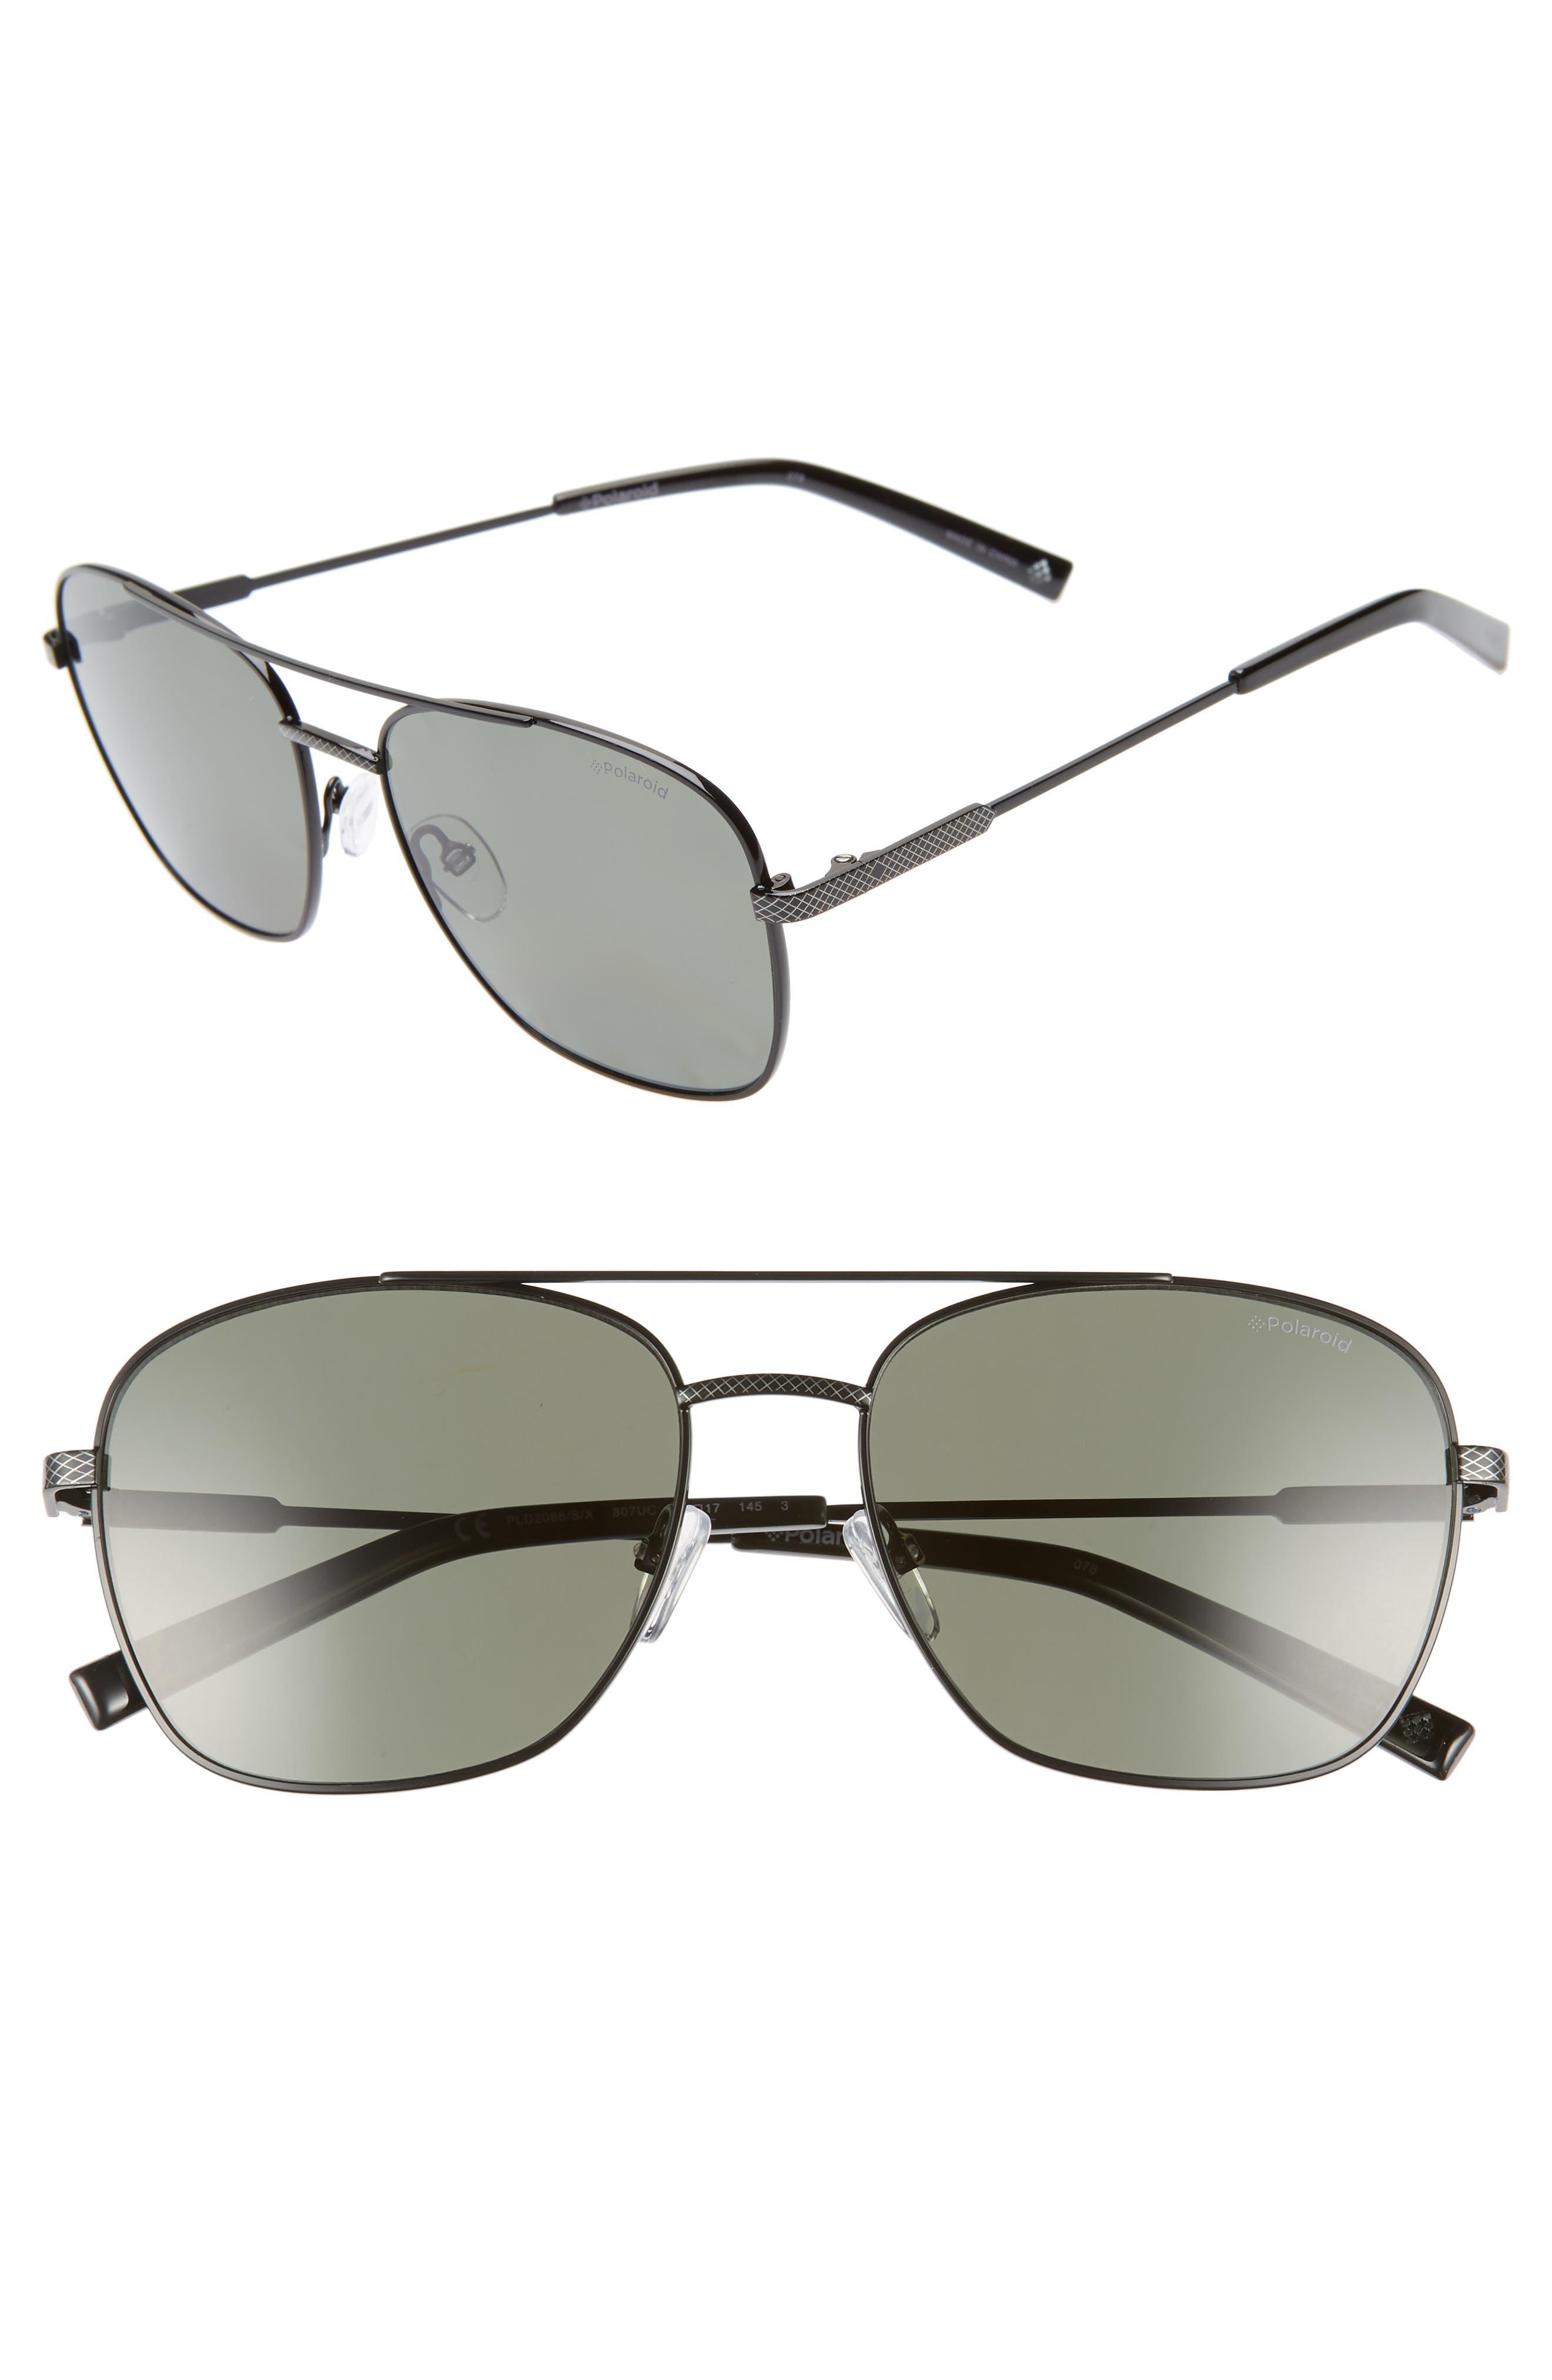 POLAROID 58Mm Polarized Navigator Sunglasses - Black